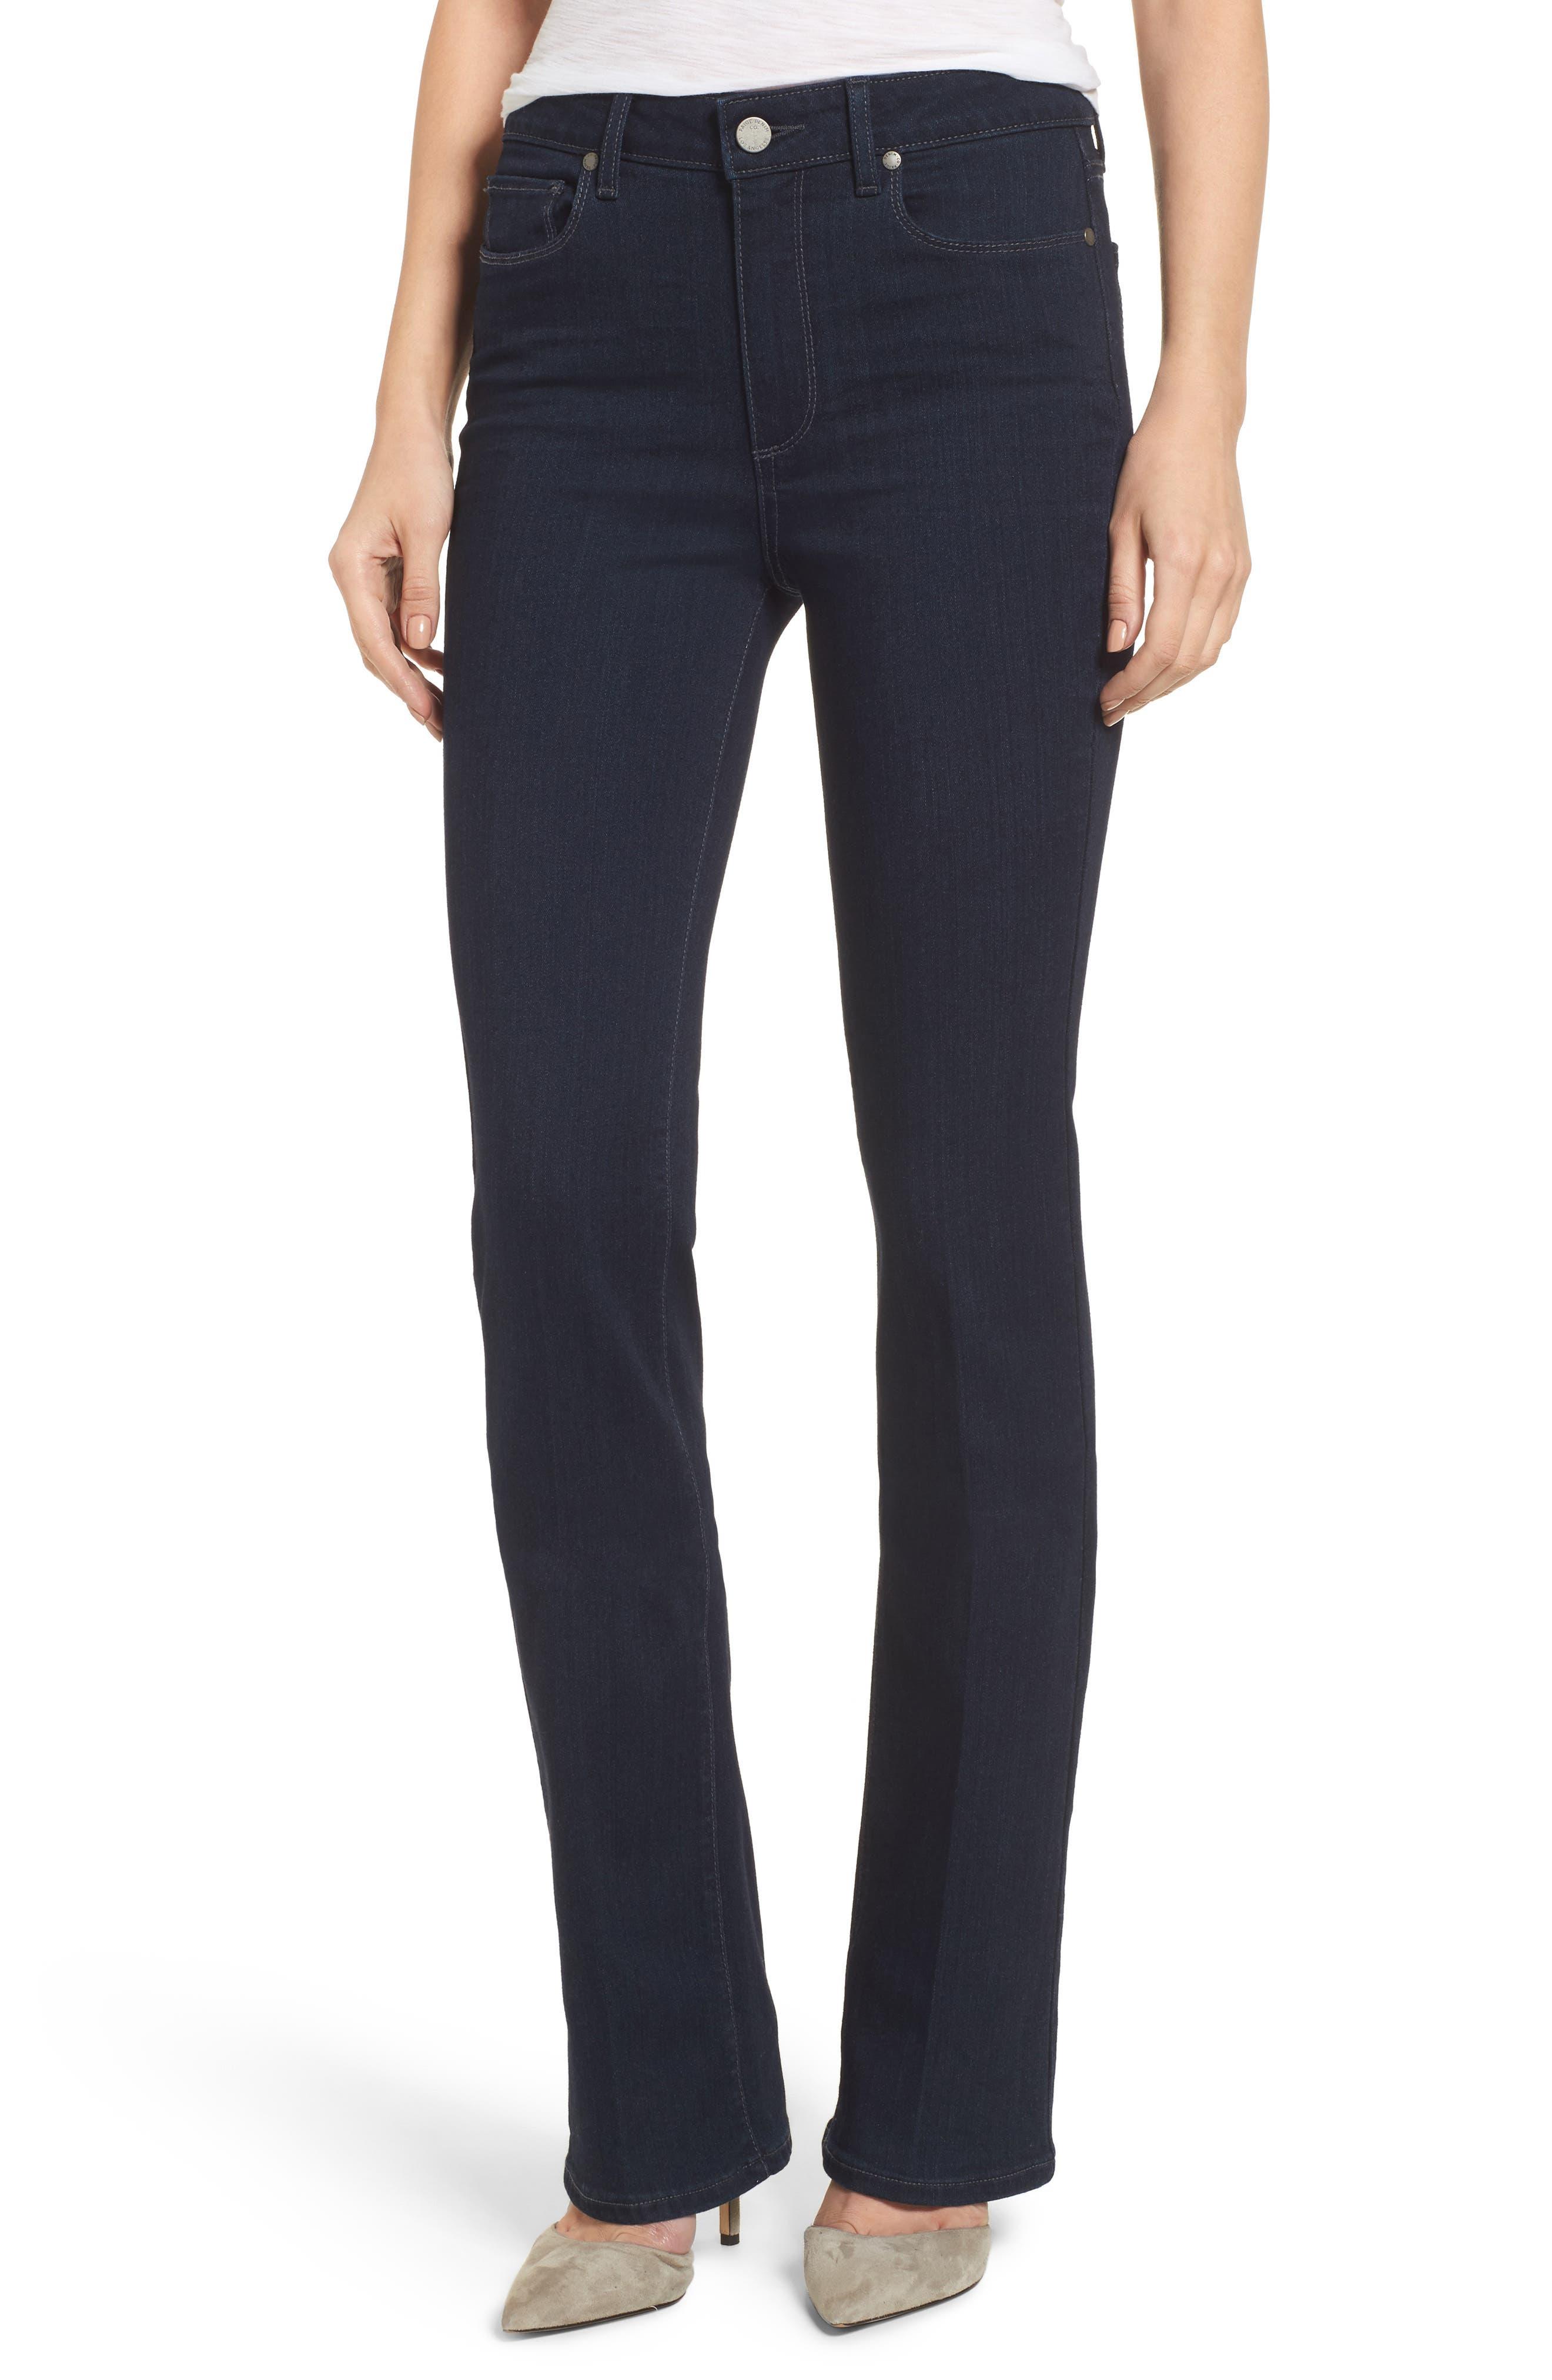 Transcend - Manhattan High Rise Bootcut Jeans,                         Main,                         color, Dalton